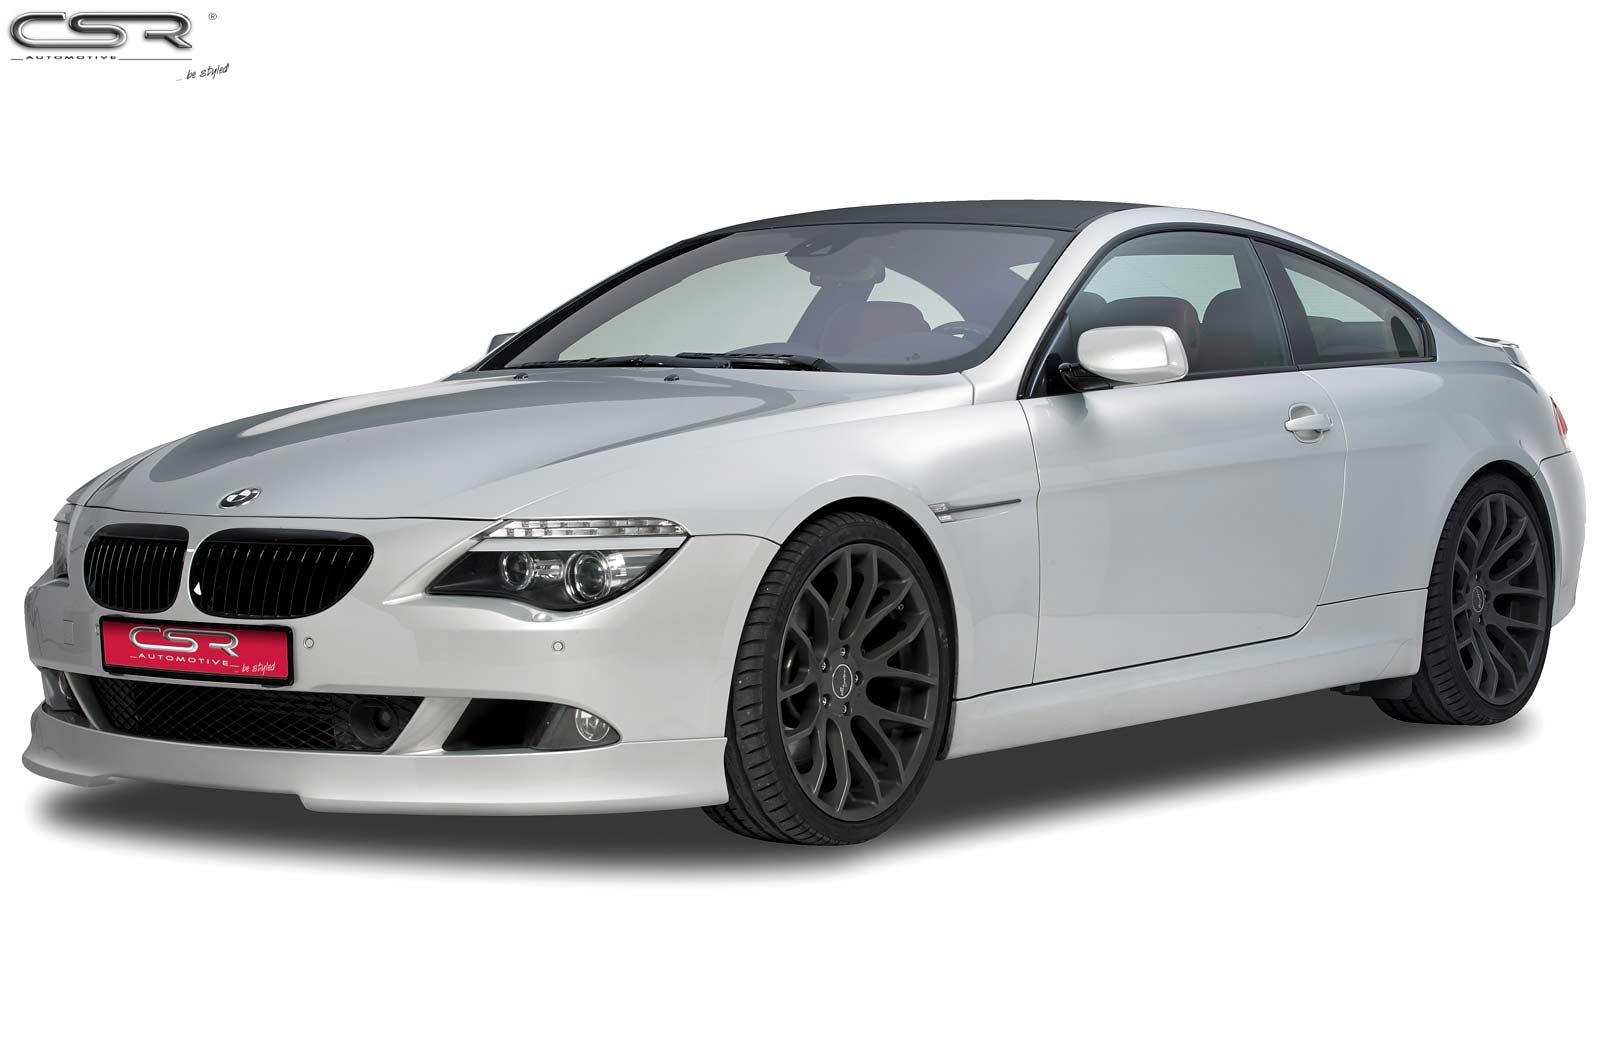 Heck Spoiler Dach Flügel Carbonlook Tuning für BMW 6er E63//E64 HF649-C